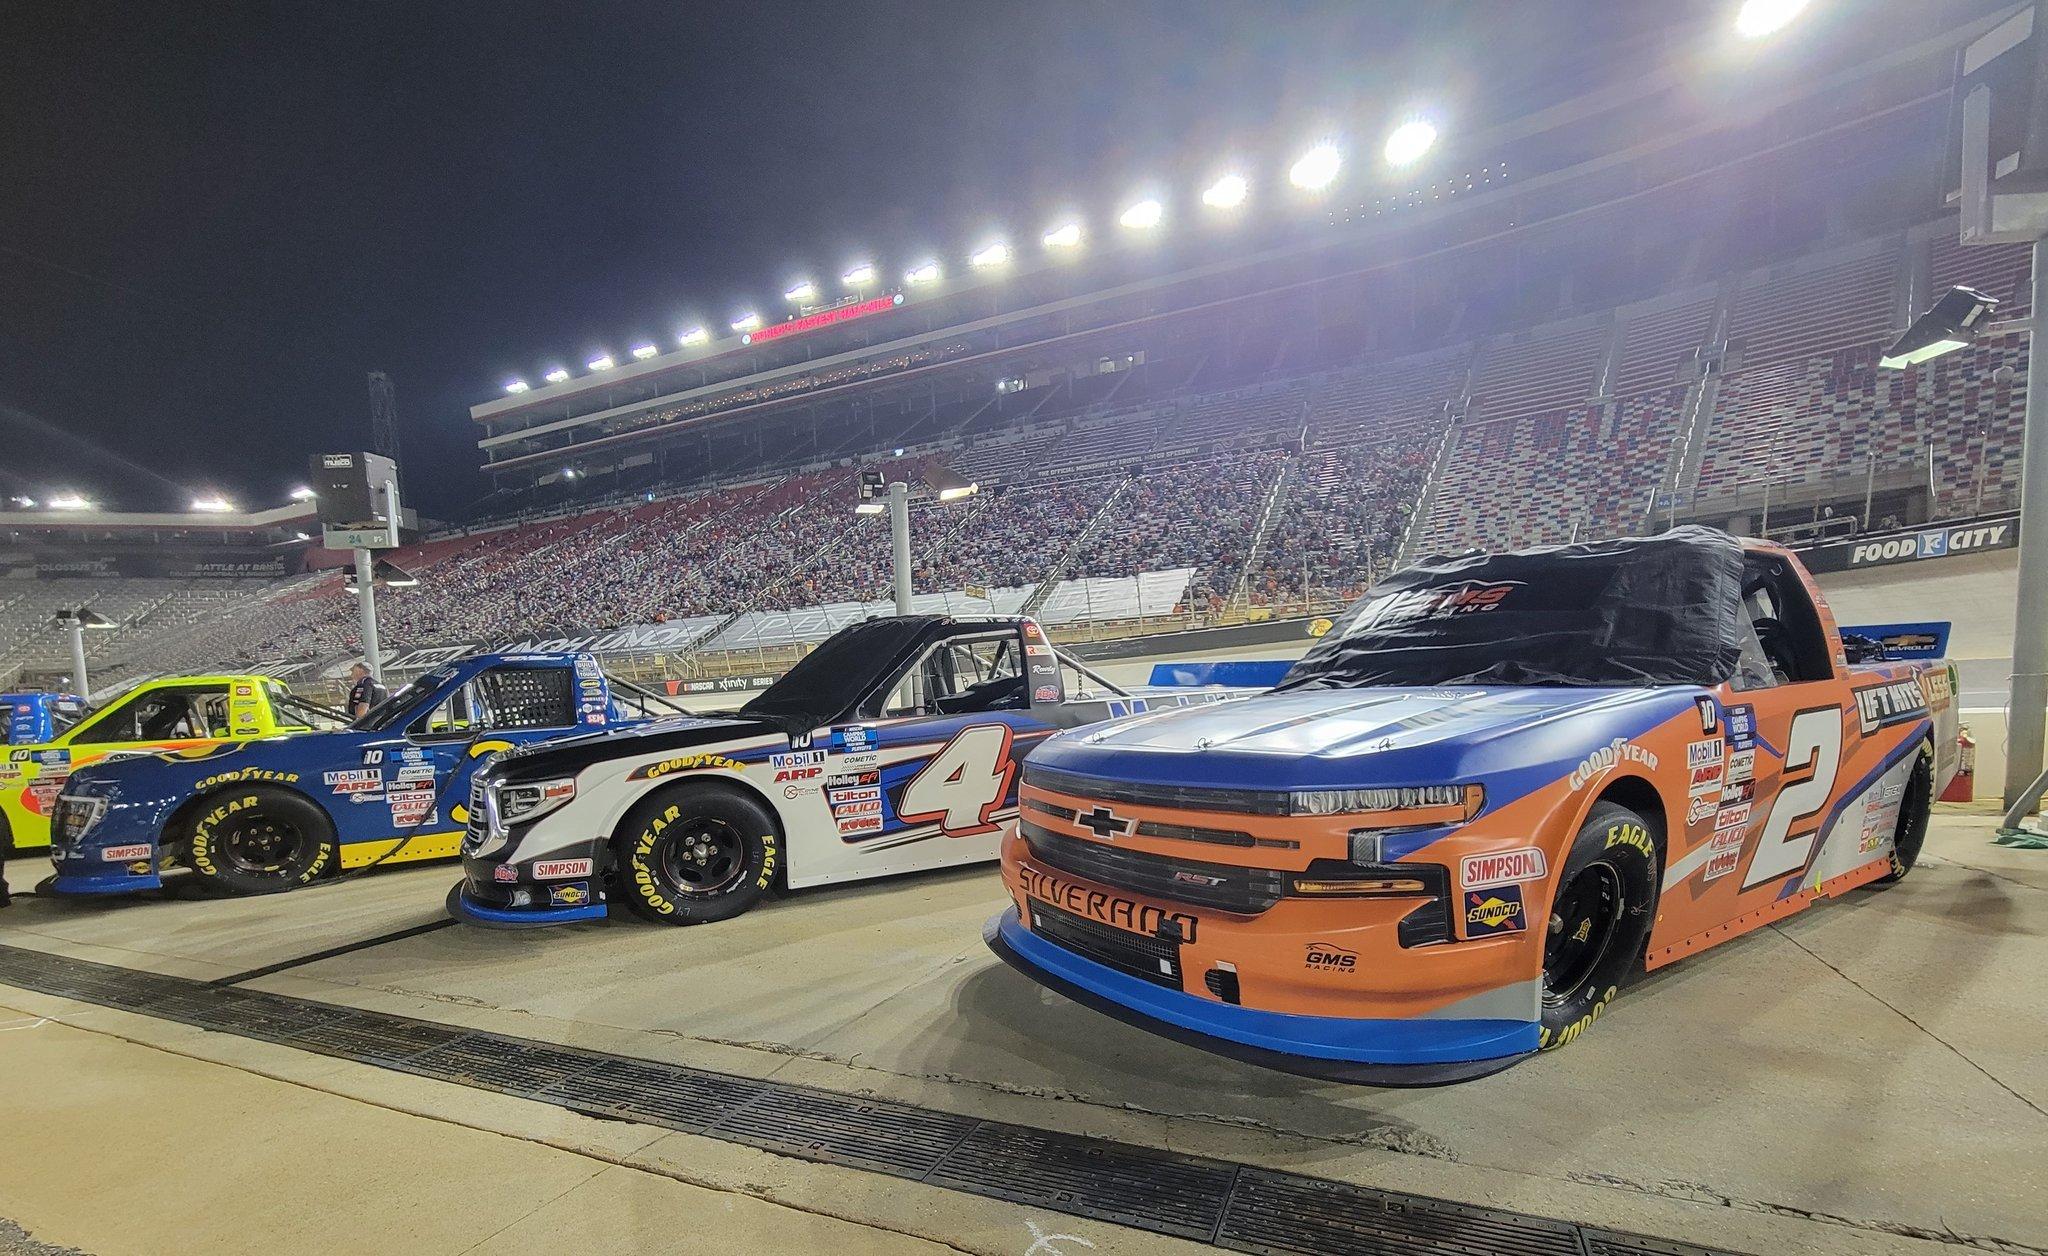 16 de septiembre de 2021 (NASCAR Truck Series) -Carreras